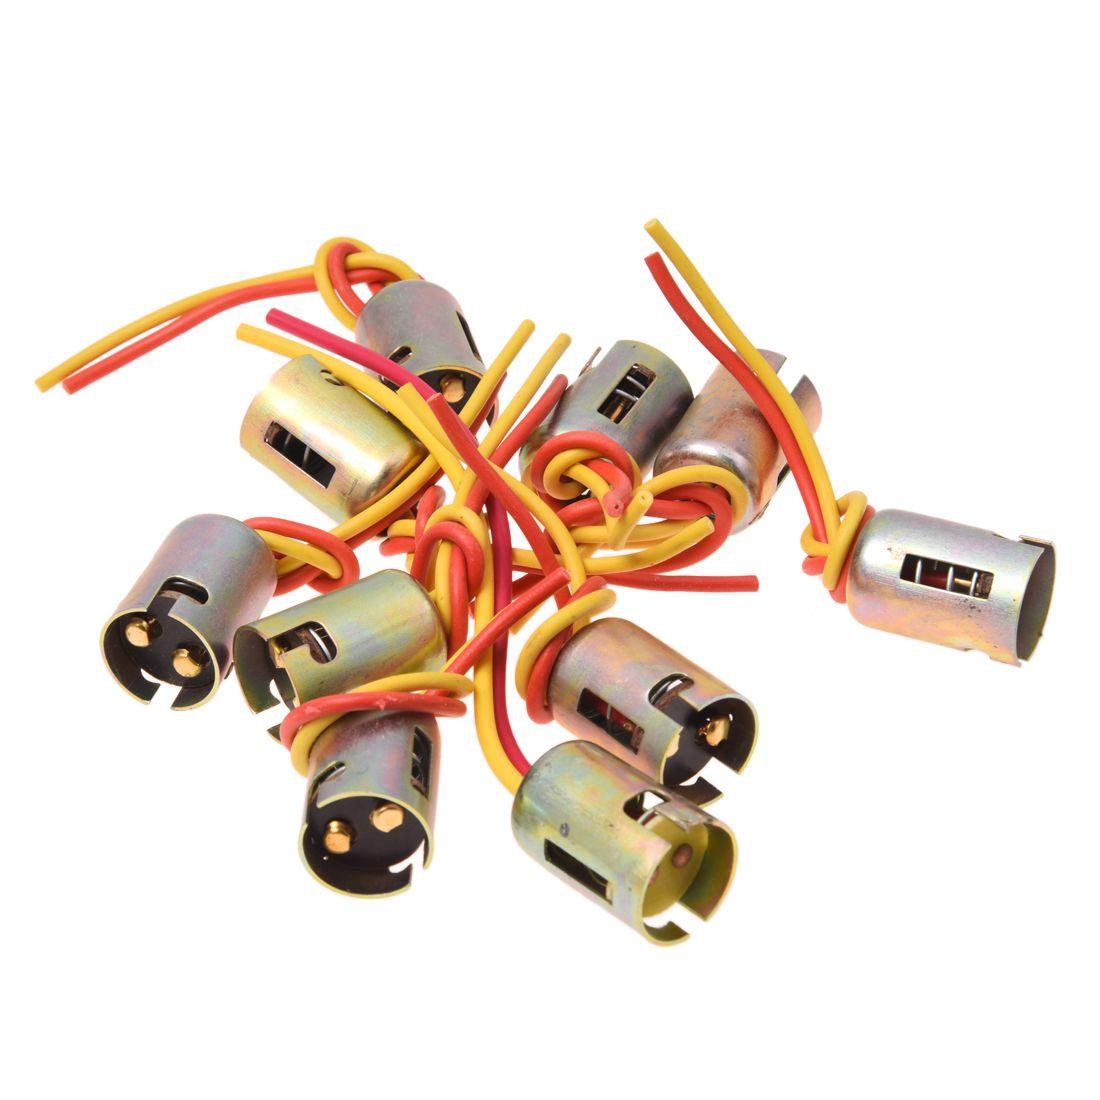 1158 2057 2357 Plug Wiring Harness Sockets For Turn Signal Light Bulb